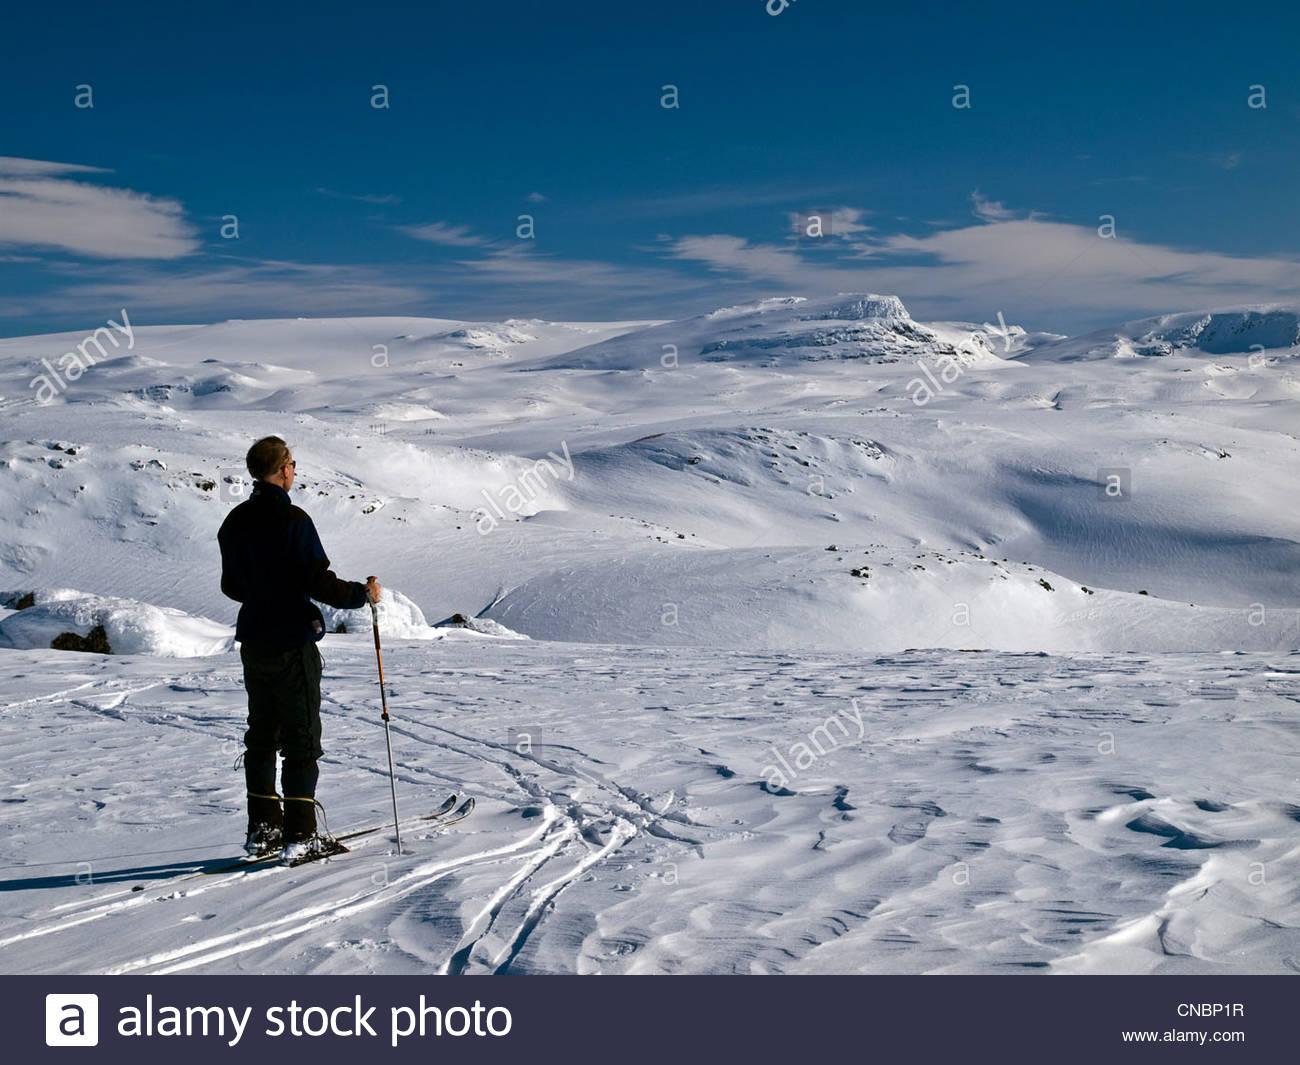 ski touring in Norway's Hardanger region - Stock Image